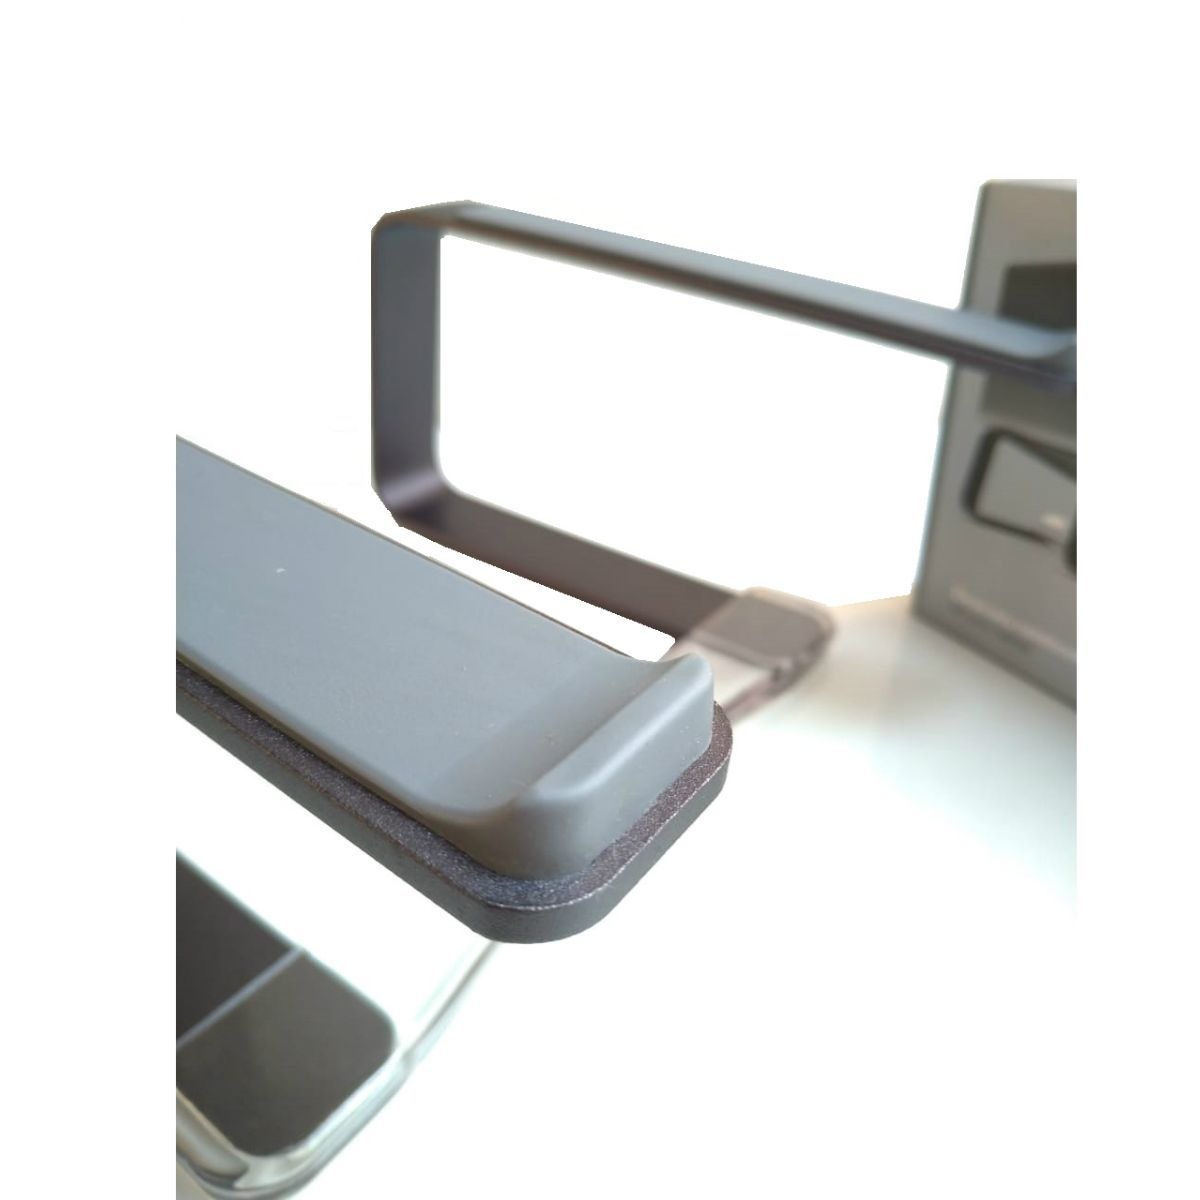 "Suporte Elevado Curv Cristal Aluminio Para Notebook Macbook 9 a 17"" - Preto Chumbo"